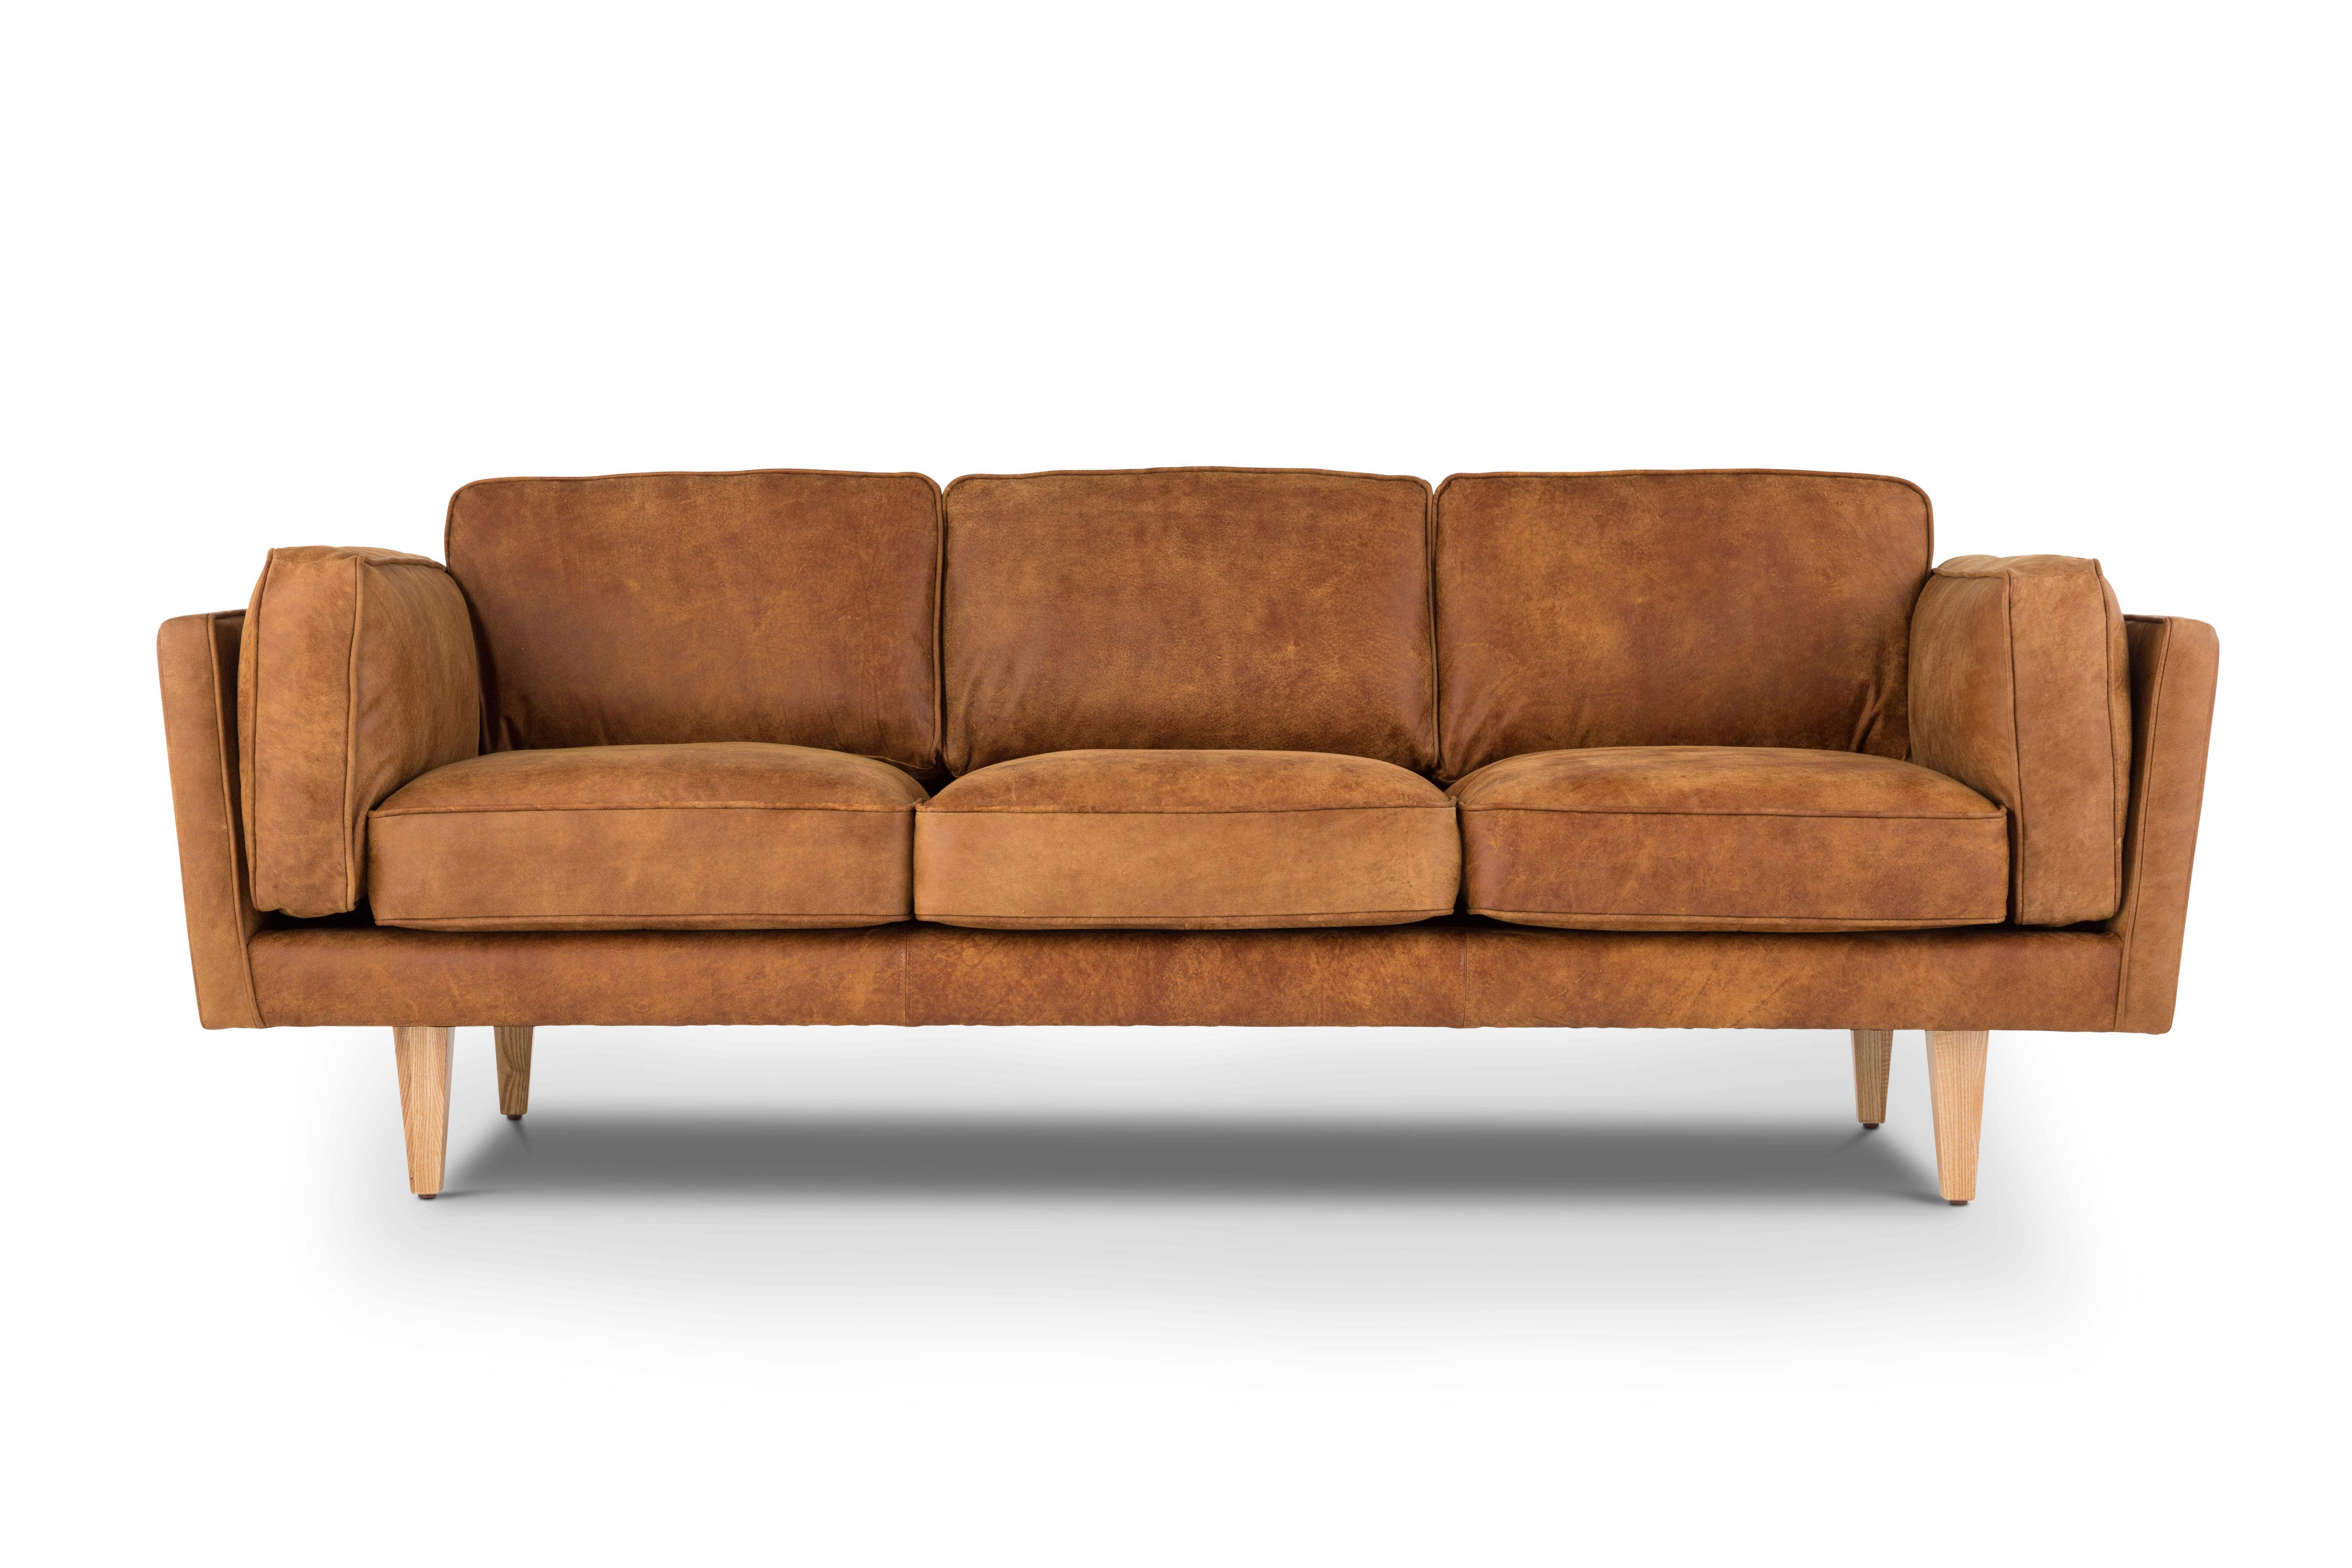 mid century modern leather sofa. Reyna In Outback Tan Leather Style/Type - Mid-century Modern Sofa / 3 Mid Century H